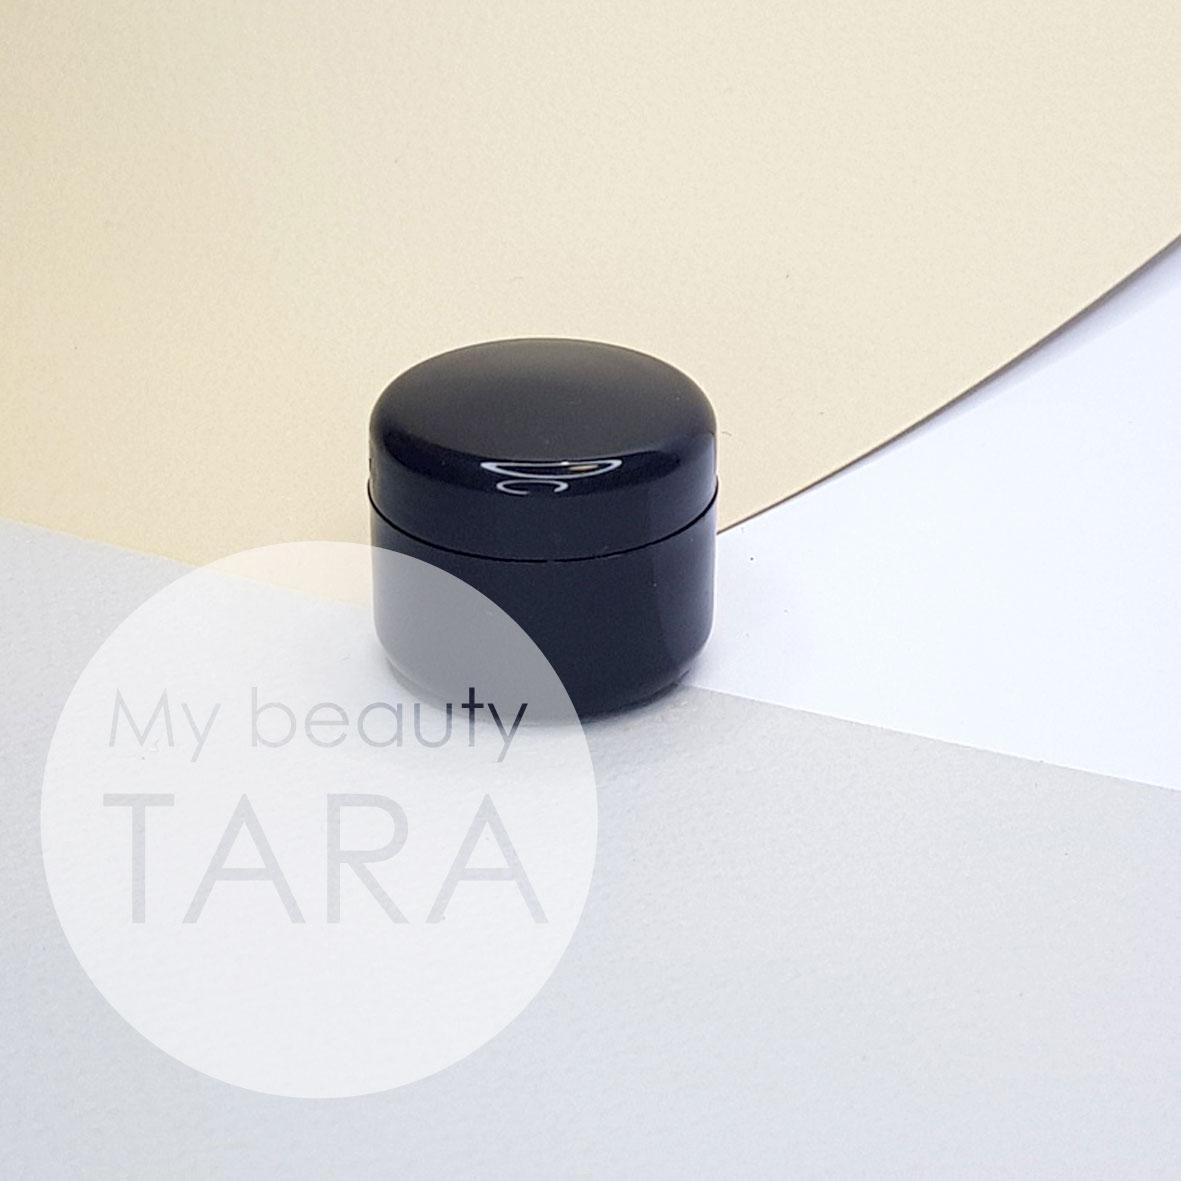 Баночка 5 мл пластикова Лаура, черная